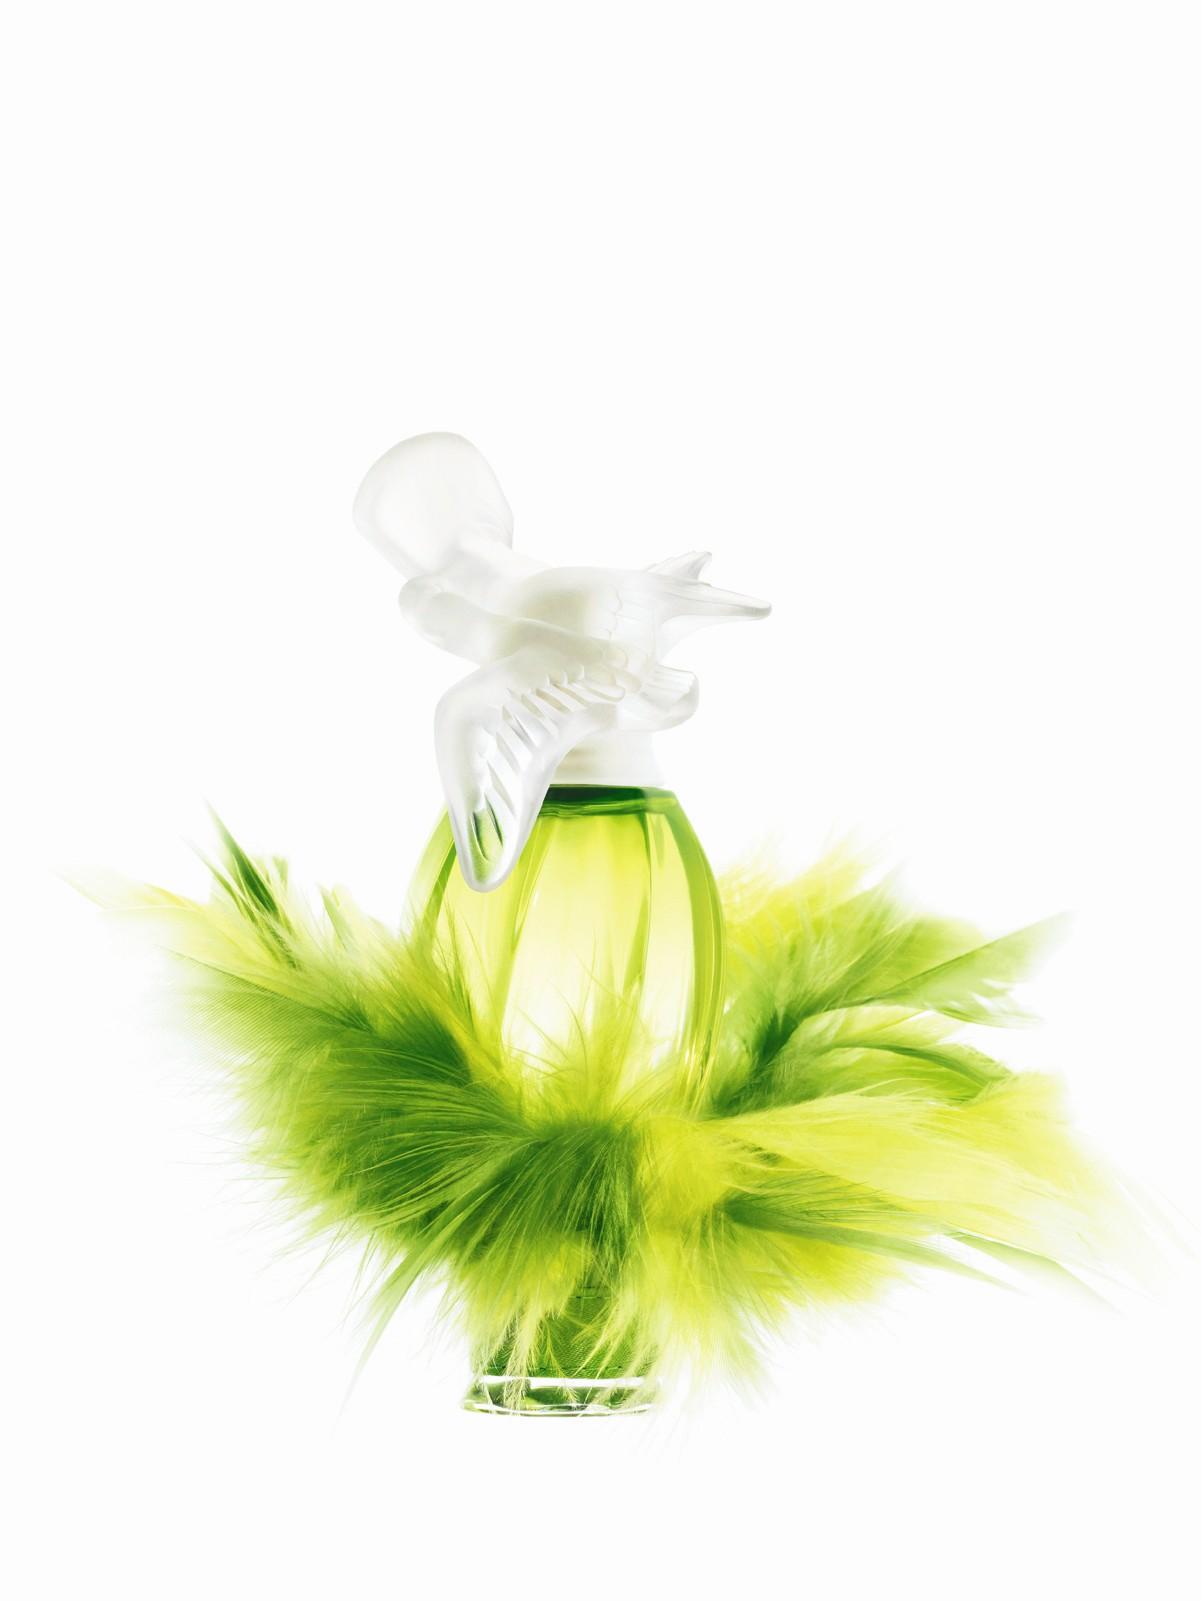 Nina Ricci L'Air Du Temps Couture Edition аромат для женщин